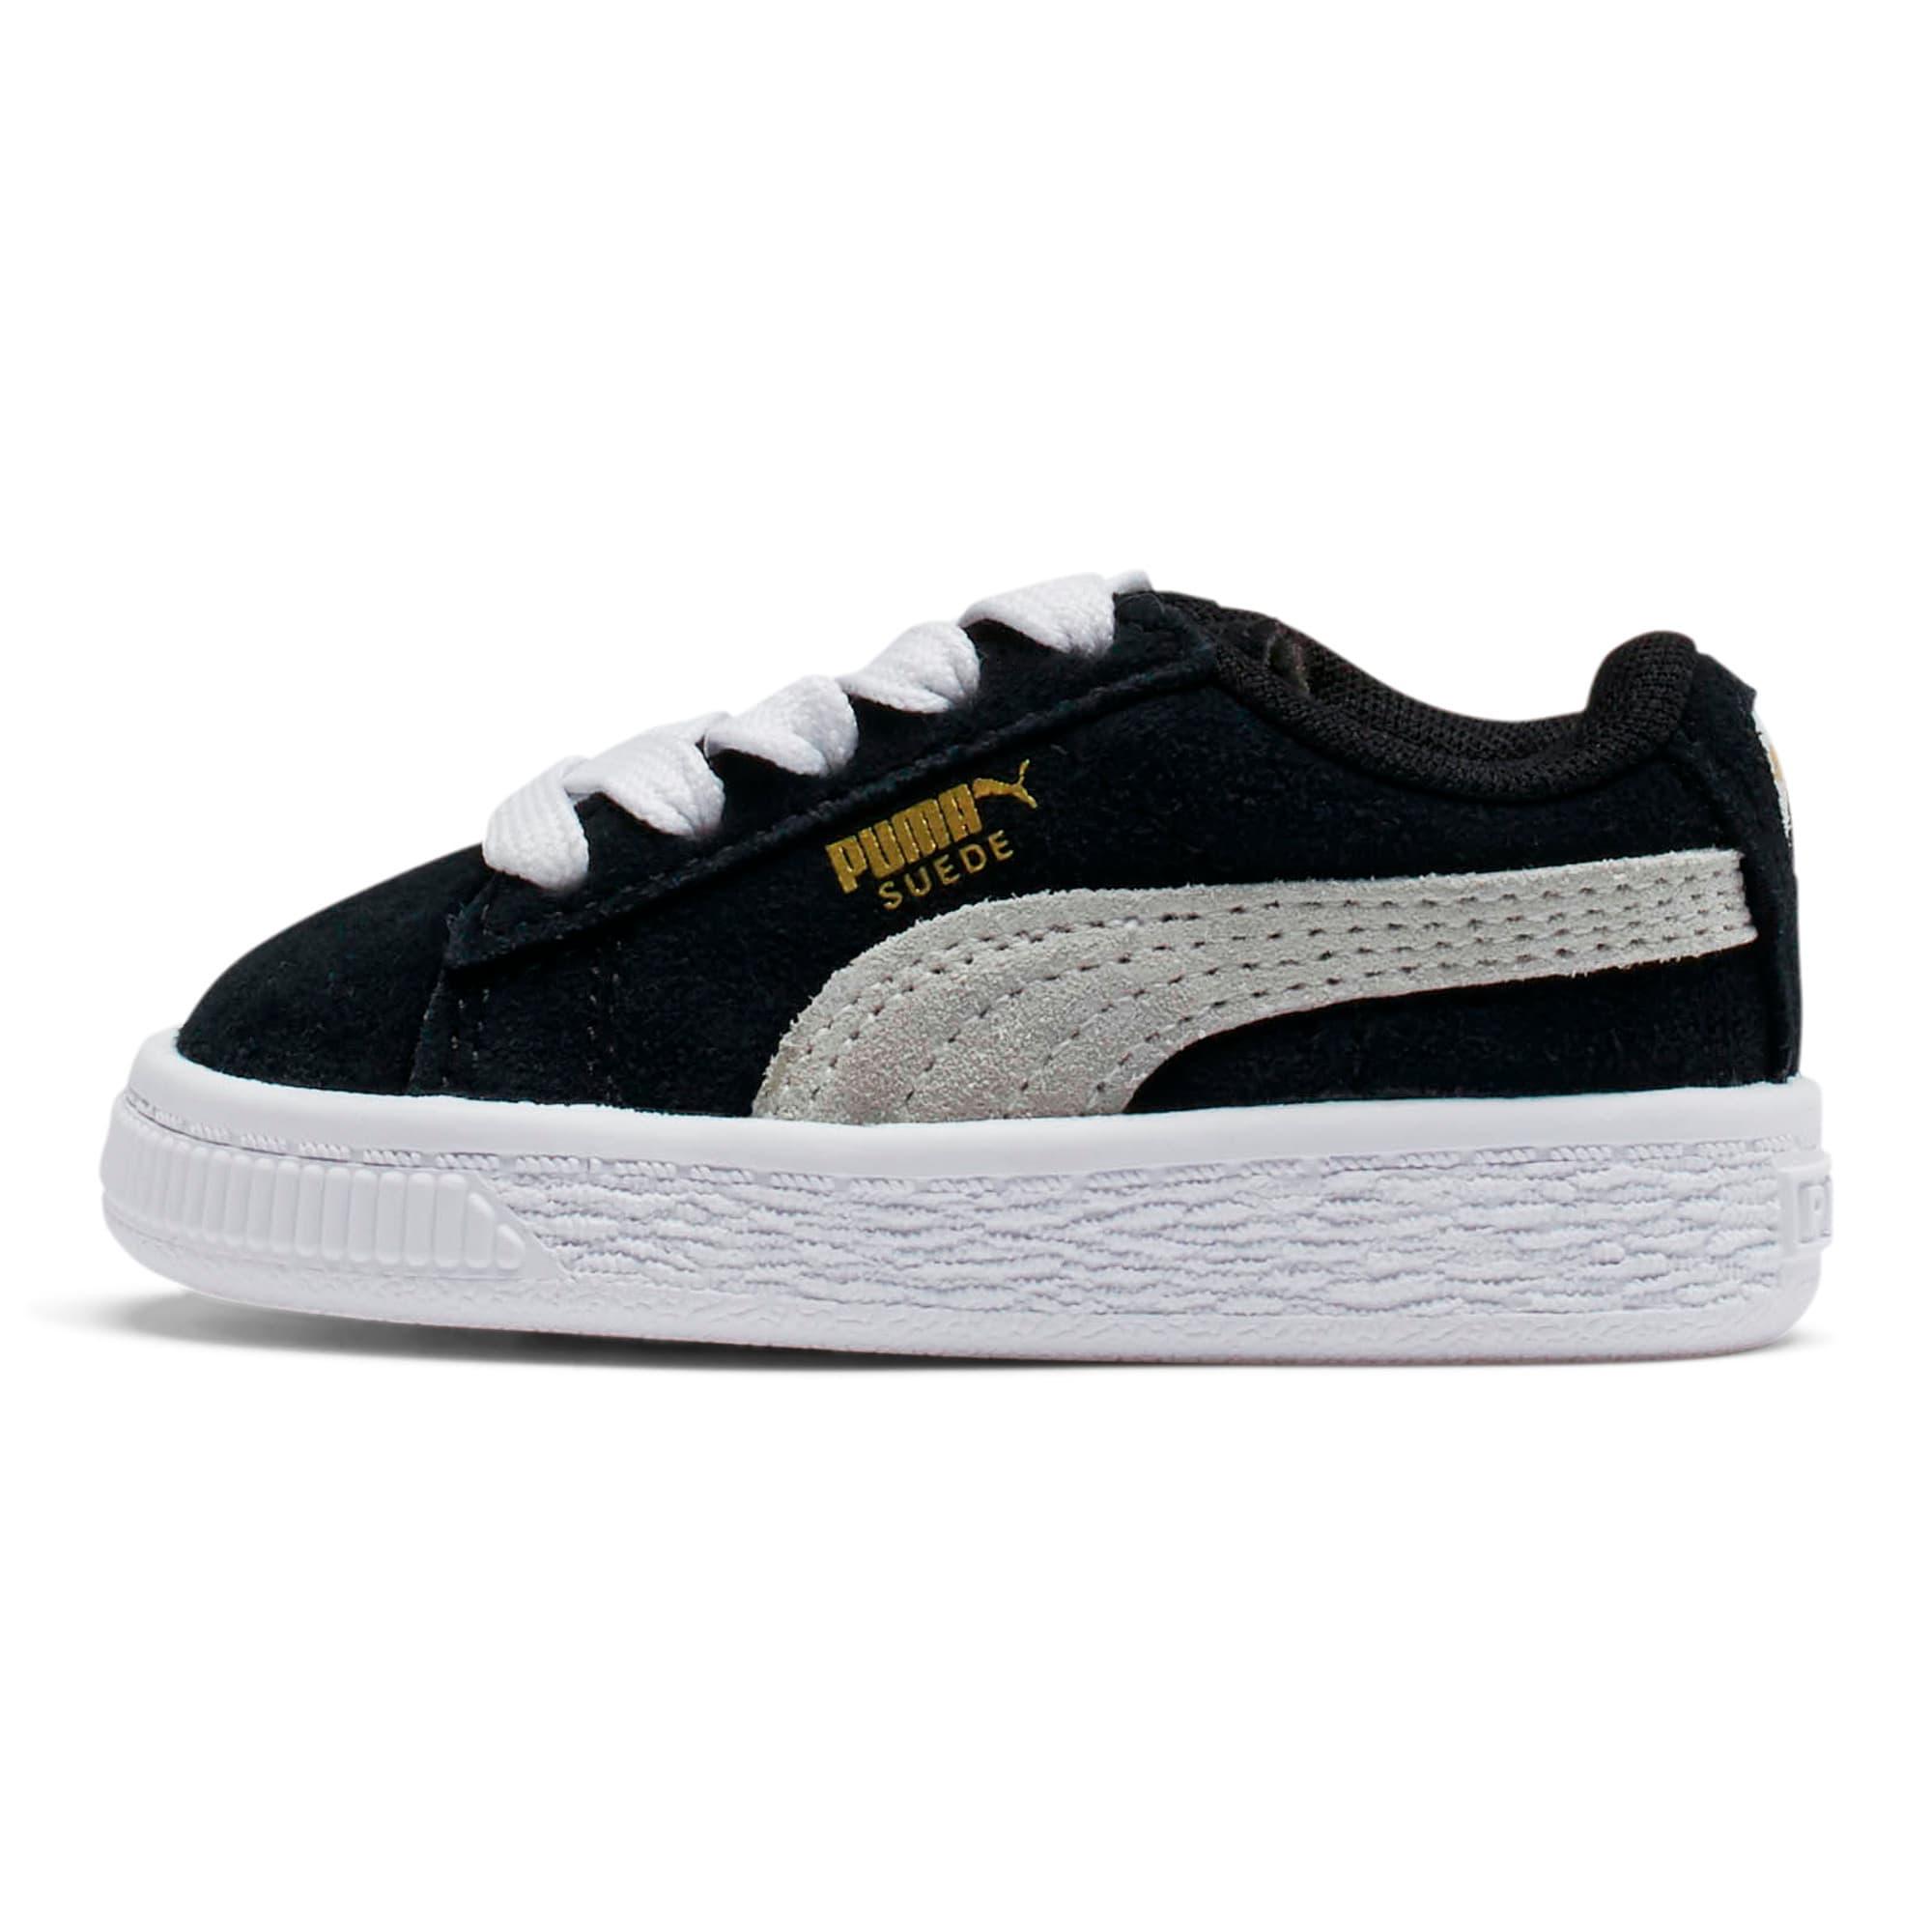 Thumbnail 1 of Puma Suede Toddler Shoes, black-white, medium